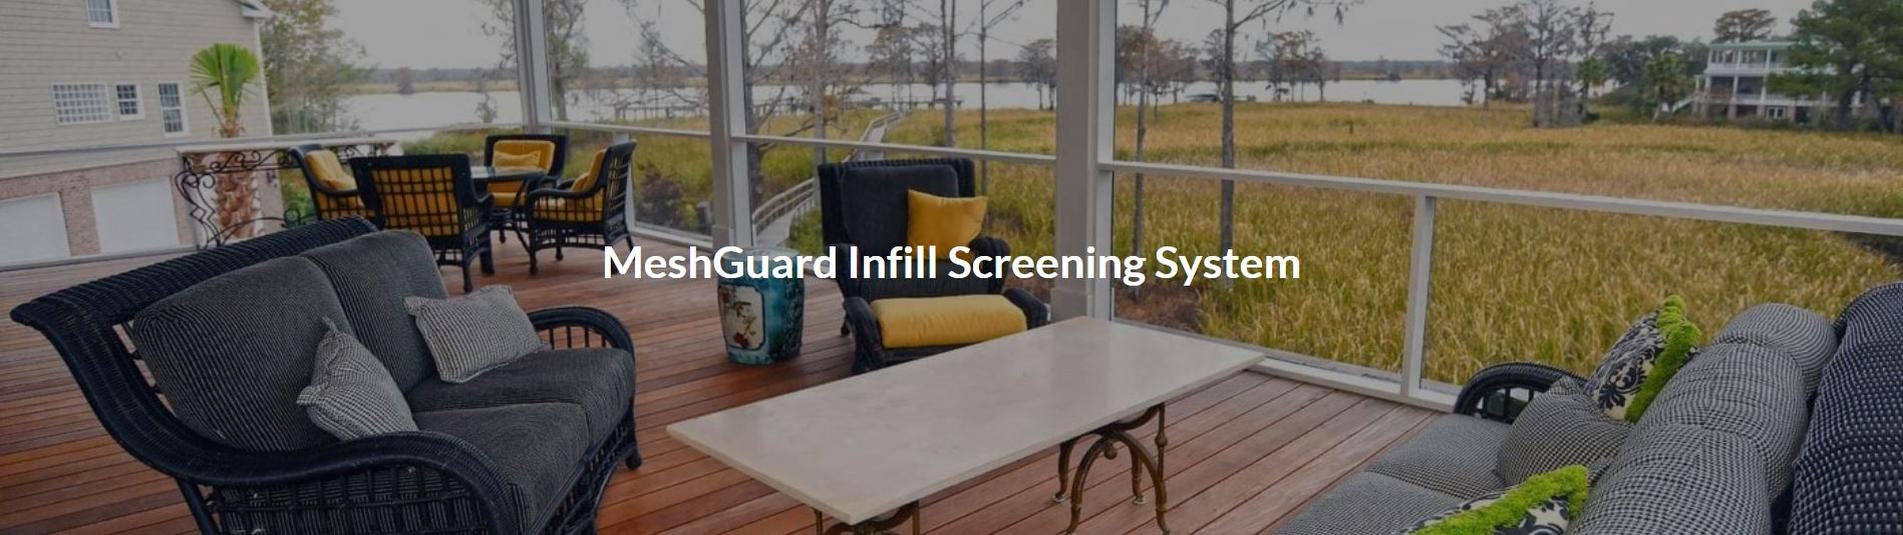 Screen Tight Mesh Guard Patio Screening